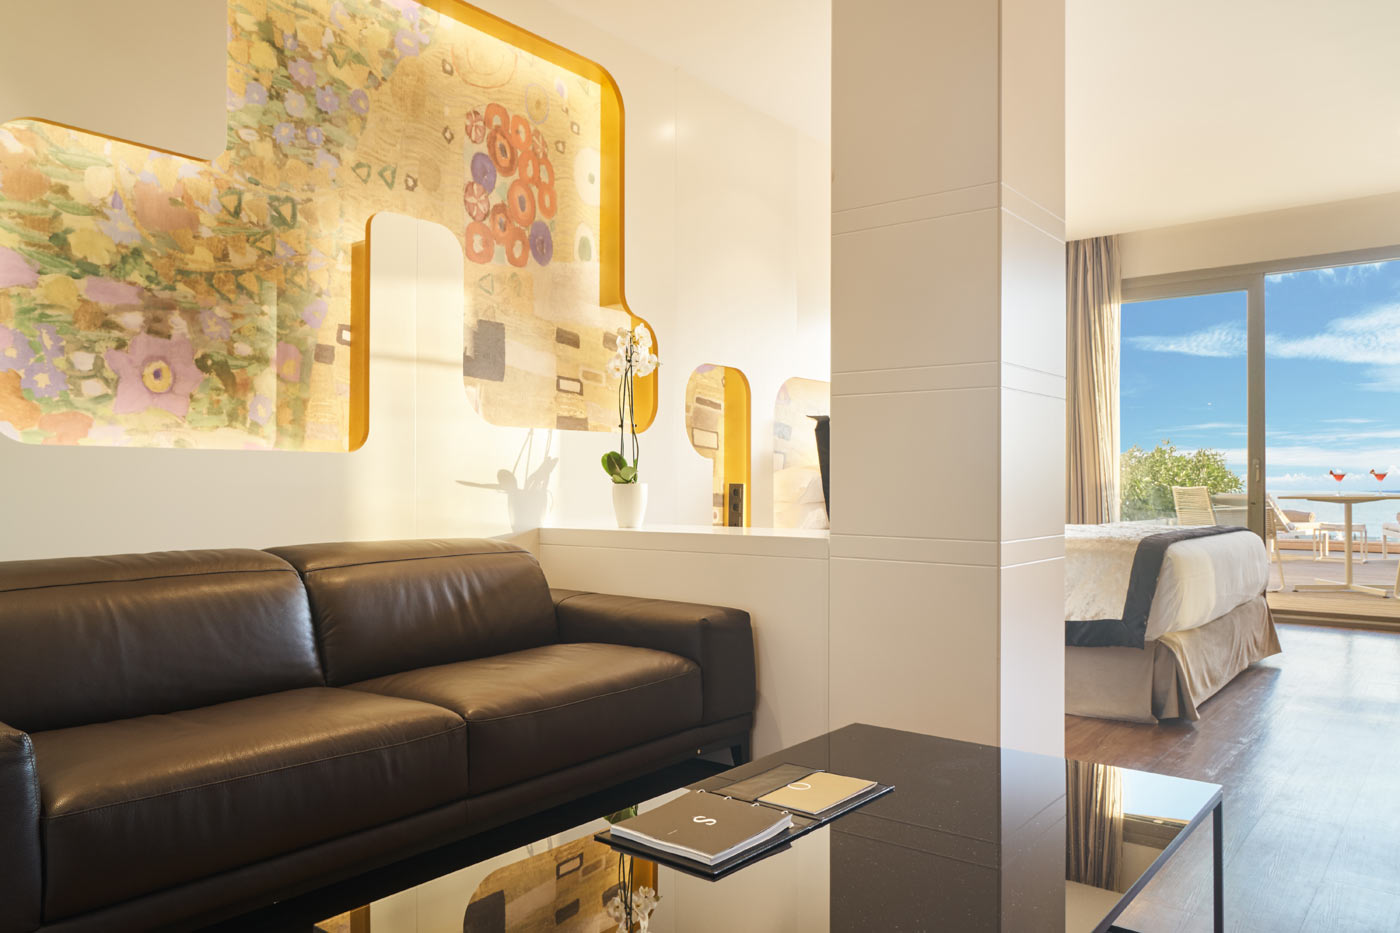 23-Pure-Salt-Port-Adriano-Ona-Suite-Living-Room-1